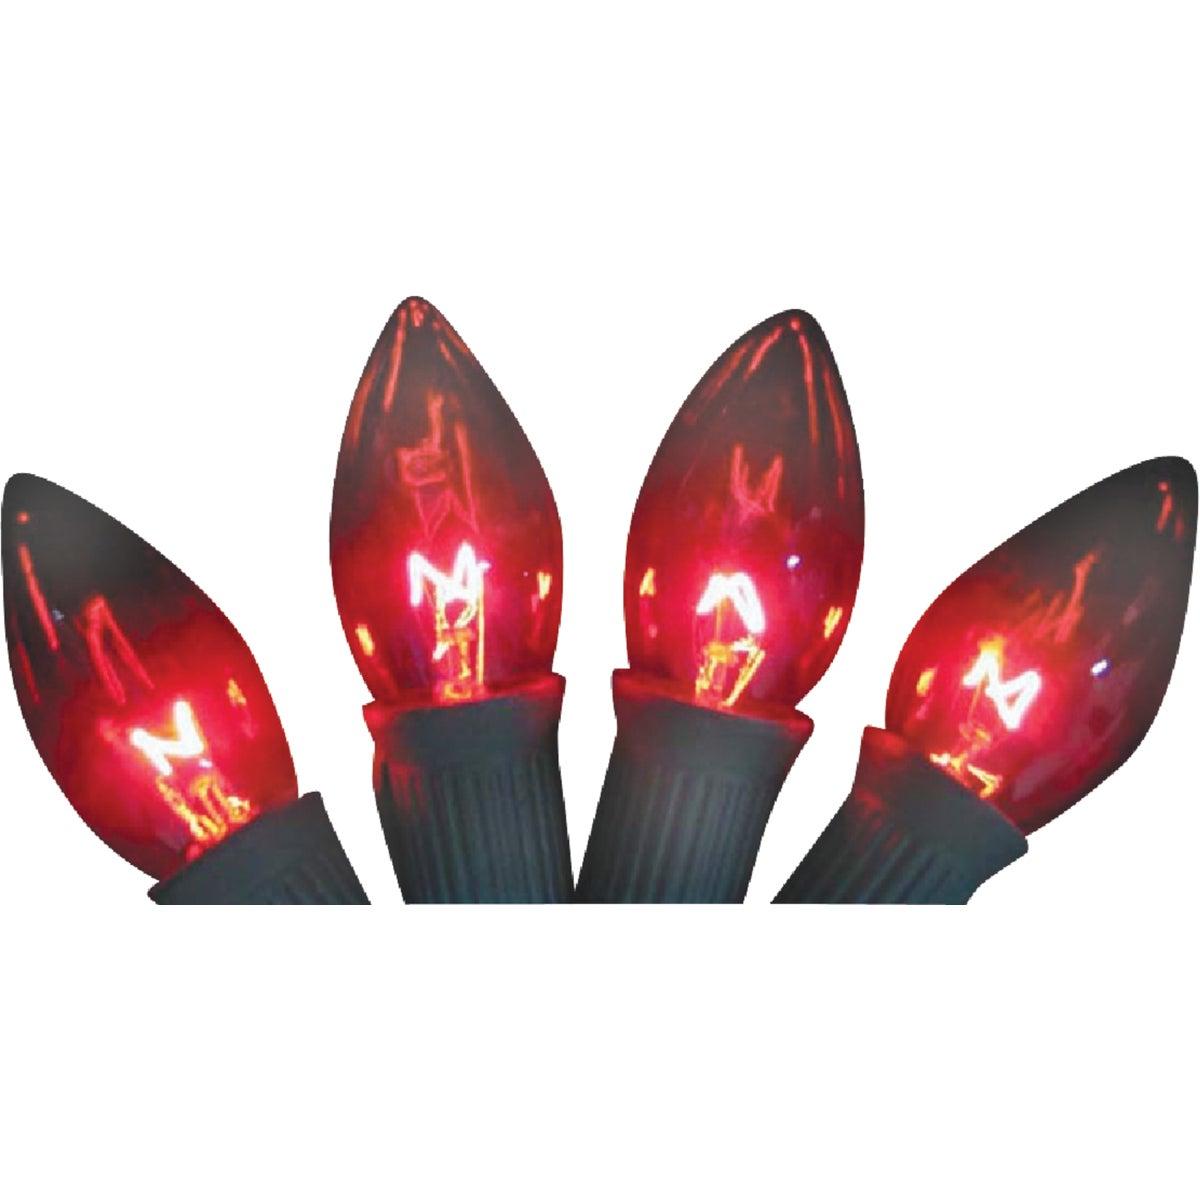 4PK C9 RED TRANS BULB